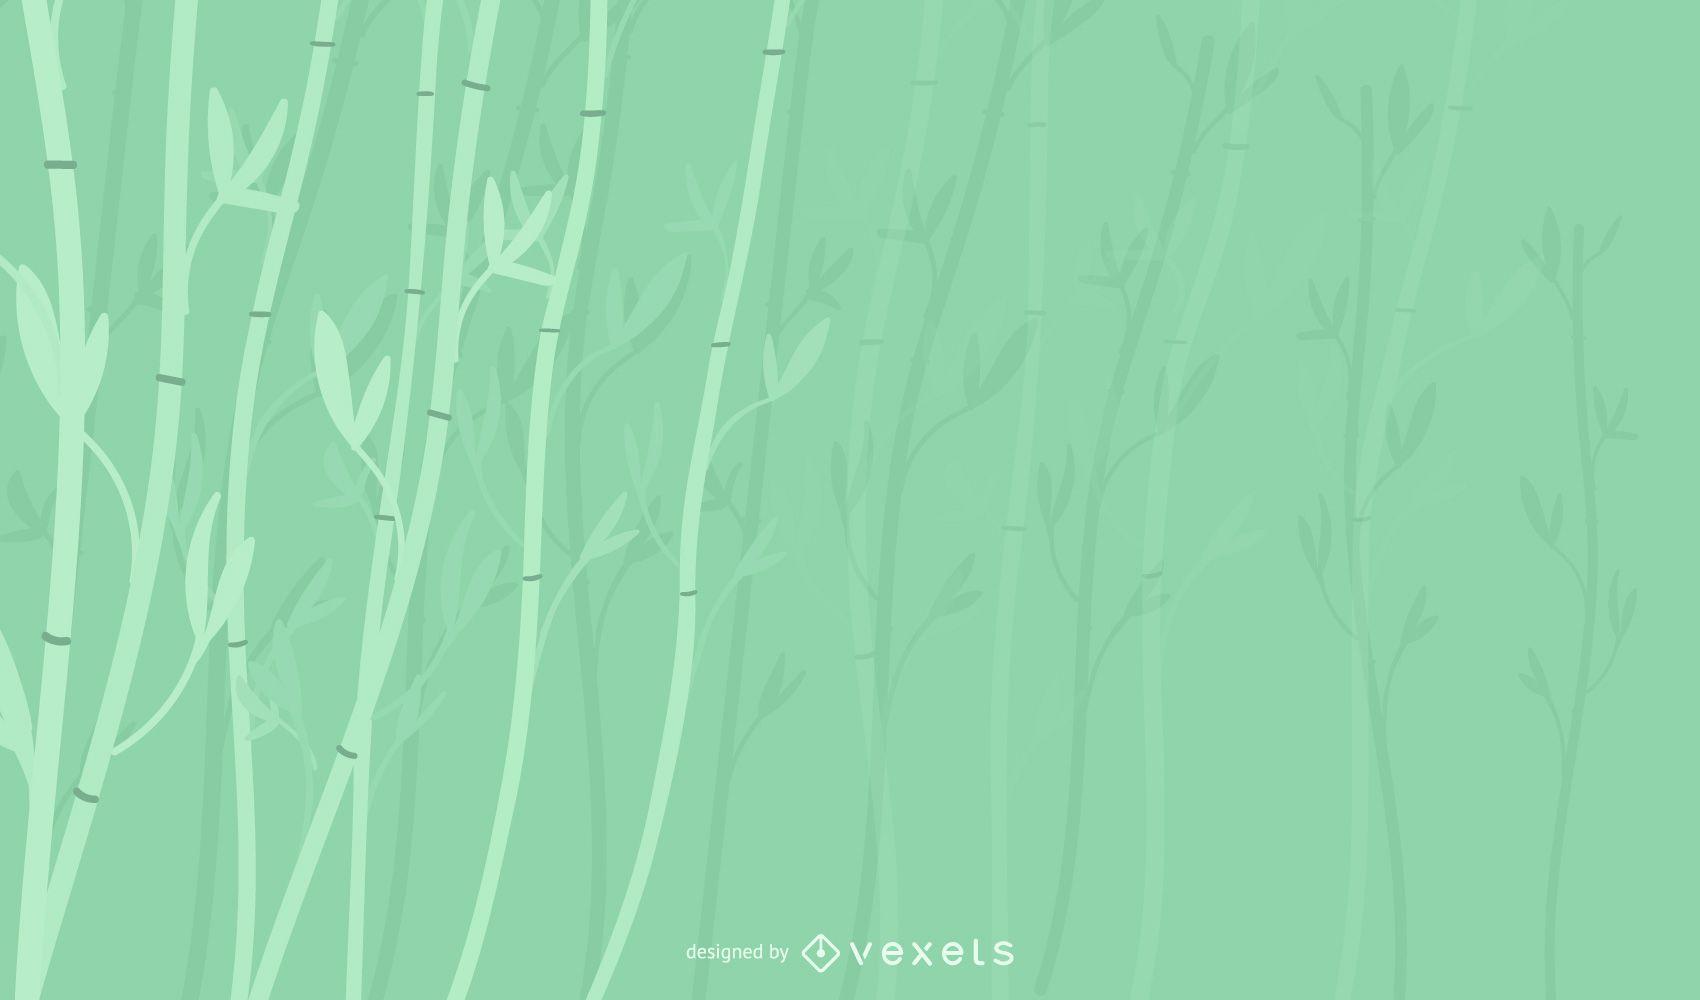 Bamboo plant background design